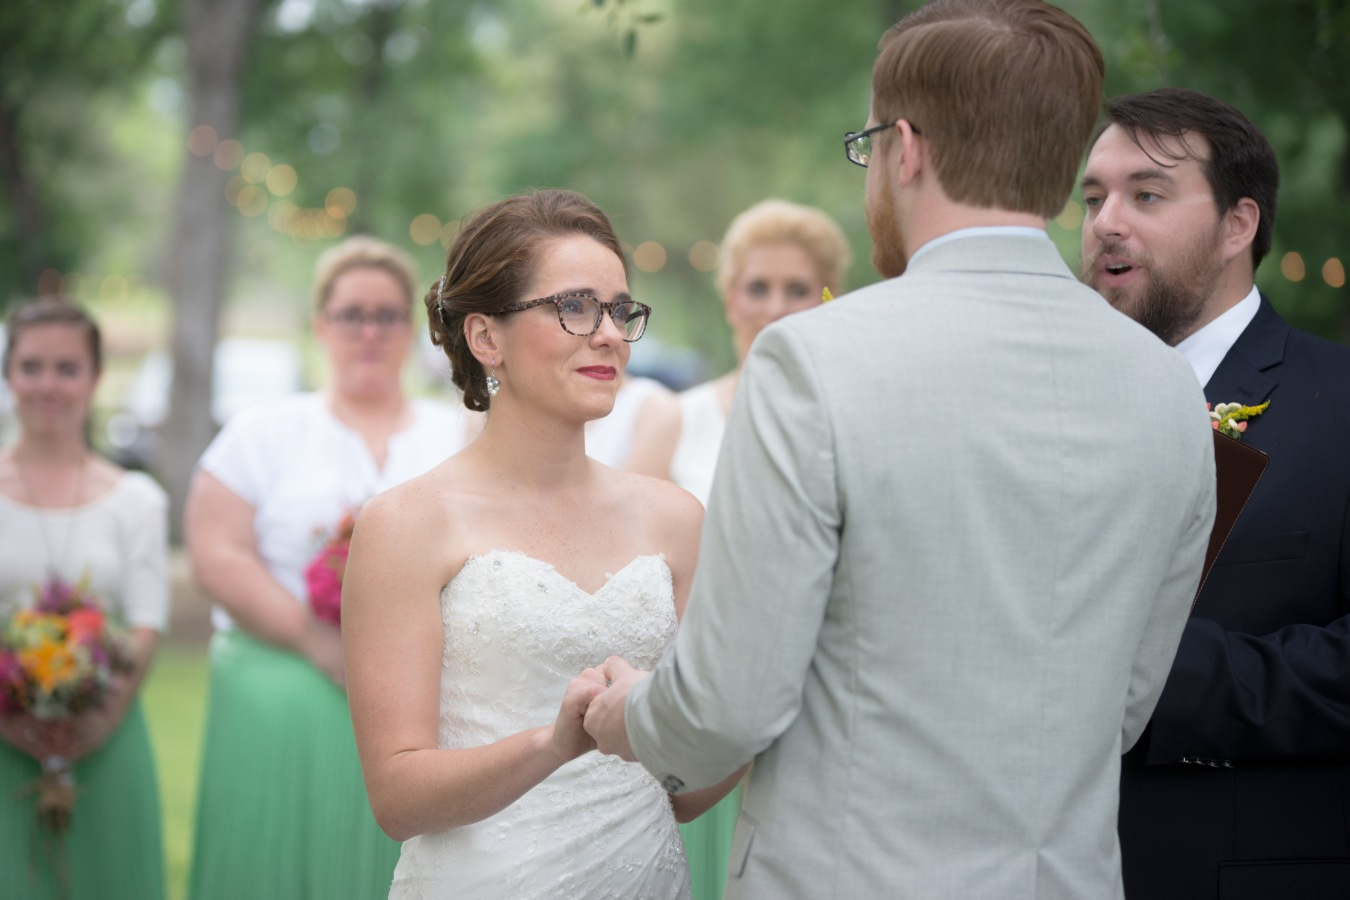 HighDot-Studios-Wedding-Cedar-Bend-Event-Center -Austin-Kim and Mike (29)